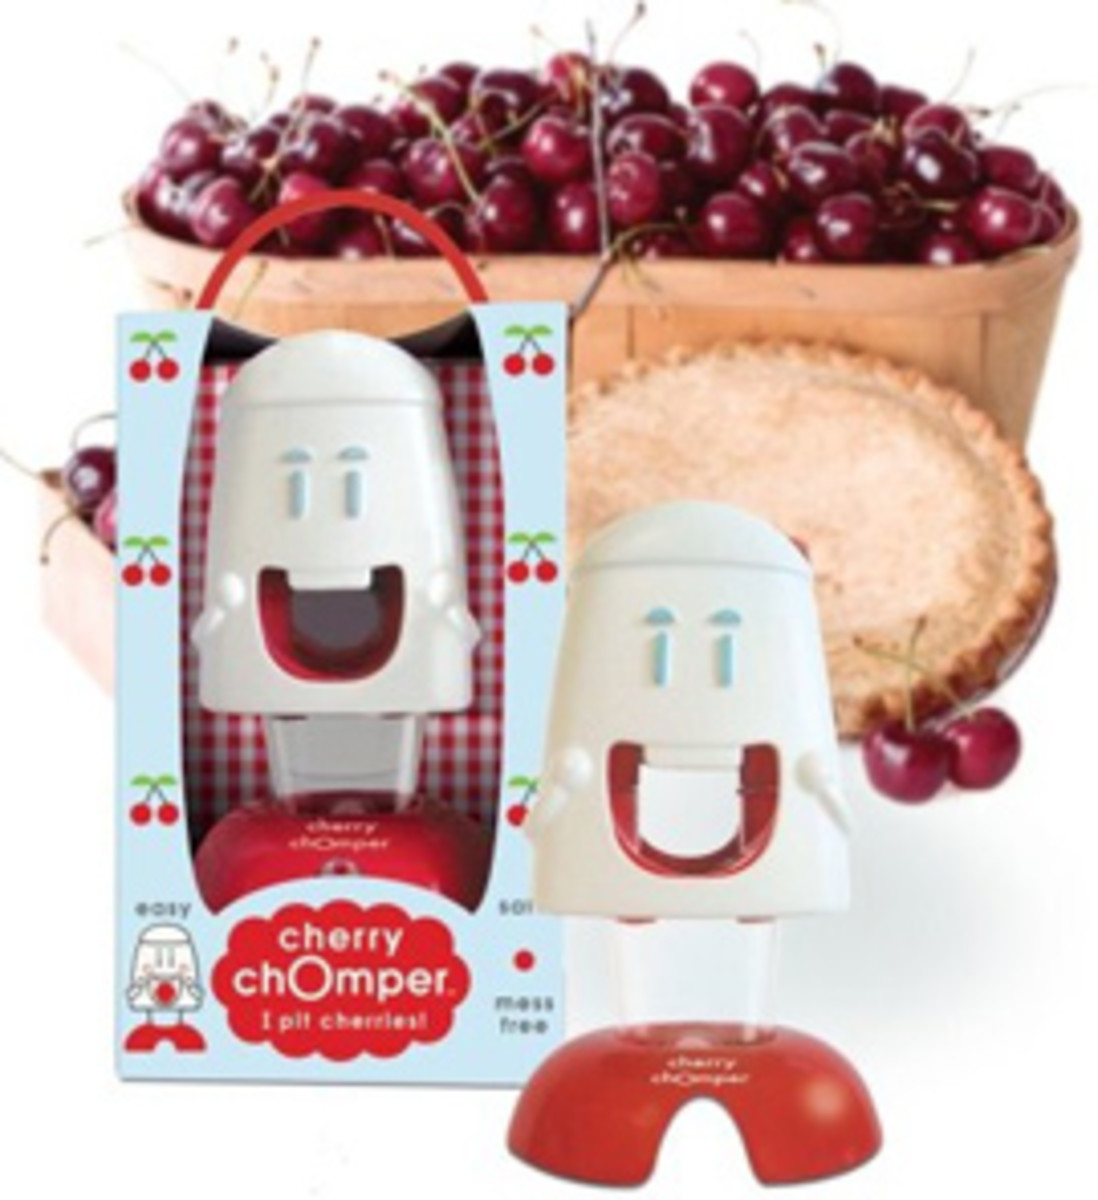 Talisman-Designs-Cherry-Chomper-Cherry-Pitter